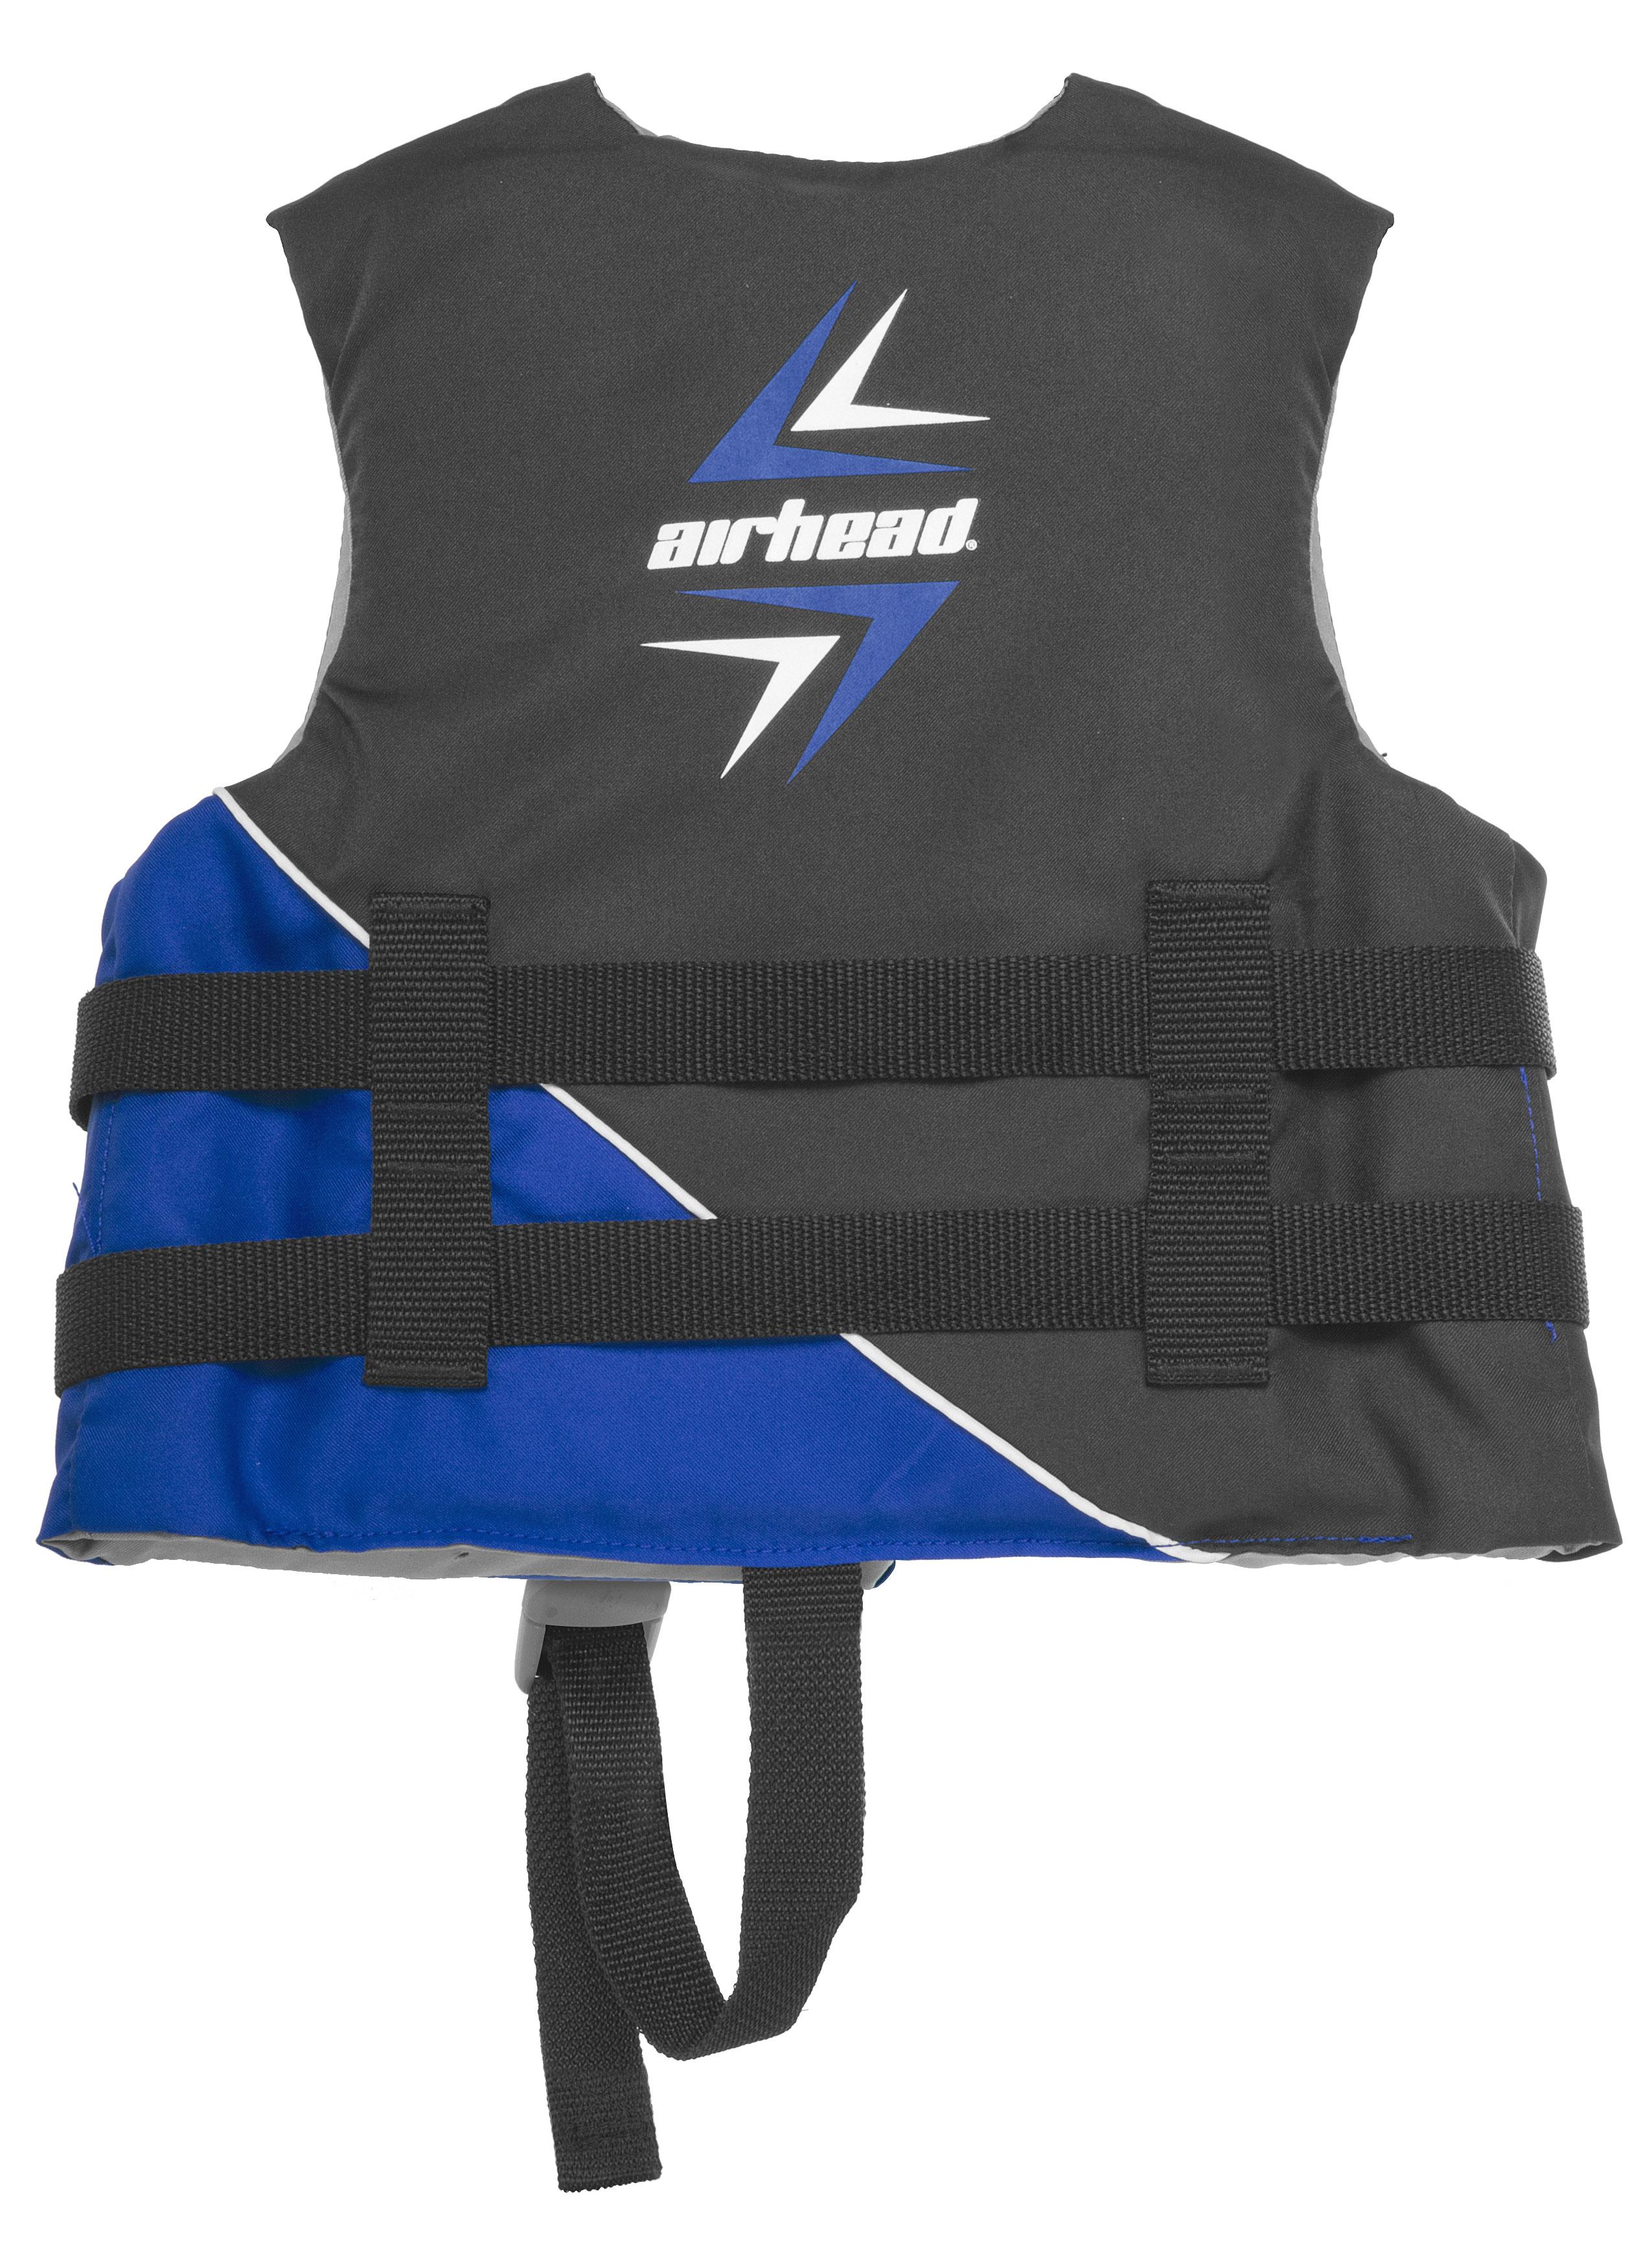 Airhead SLASH Life Vest, Children 30-50 ibs, Blue Black by AIRHEAD SPORTS GROUP